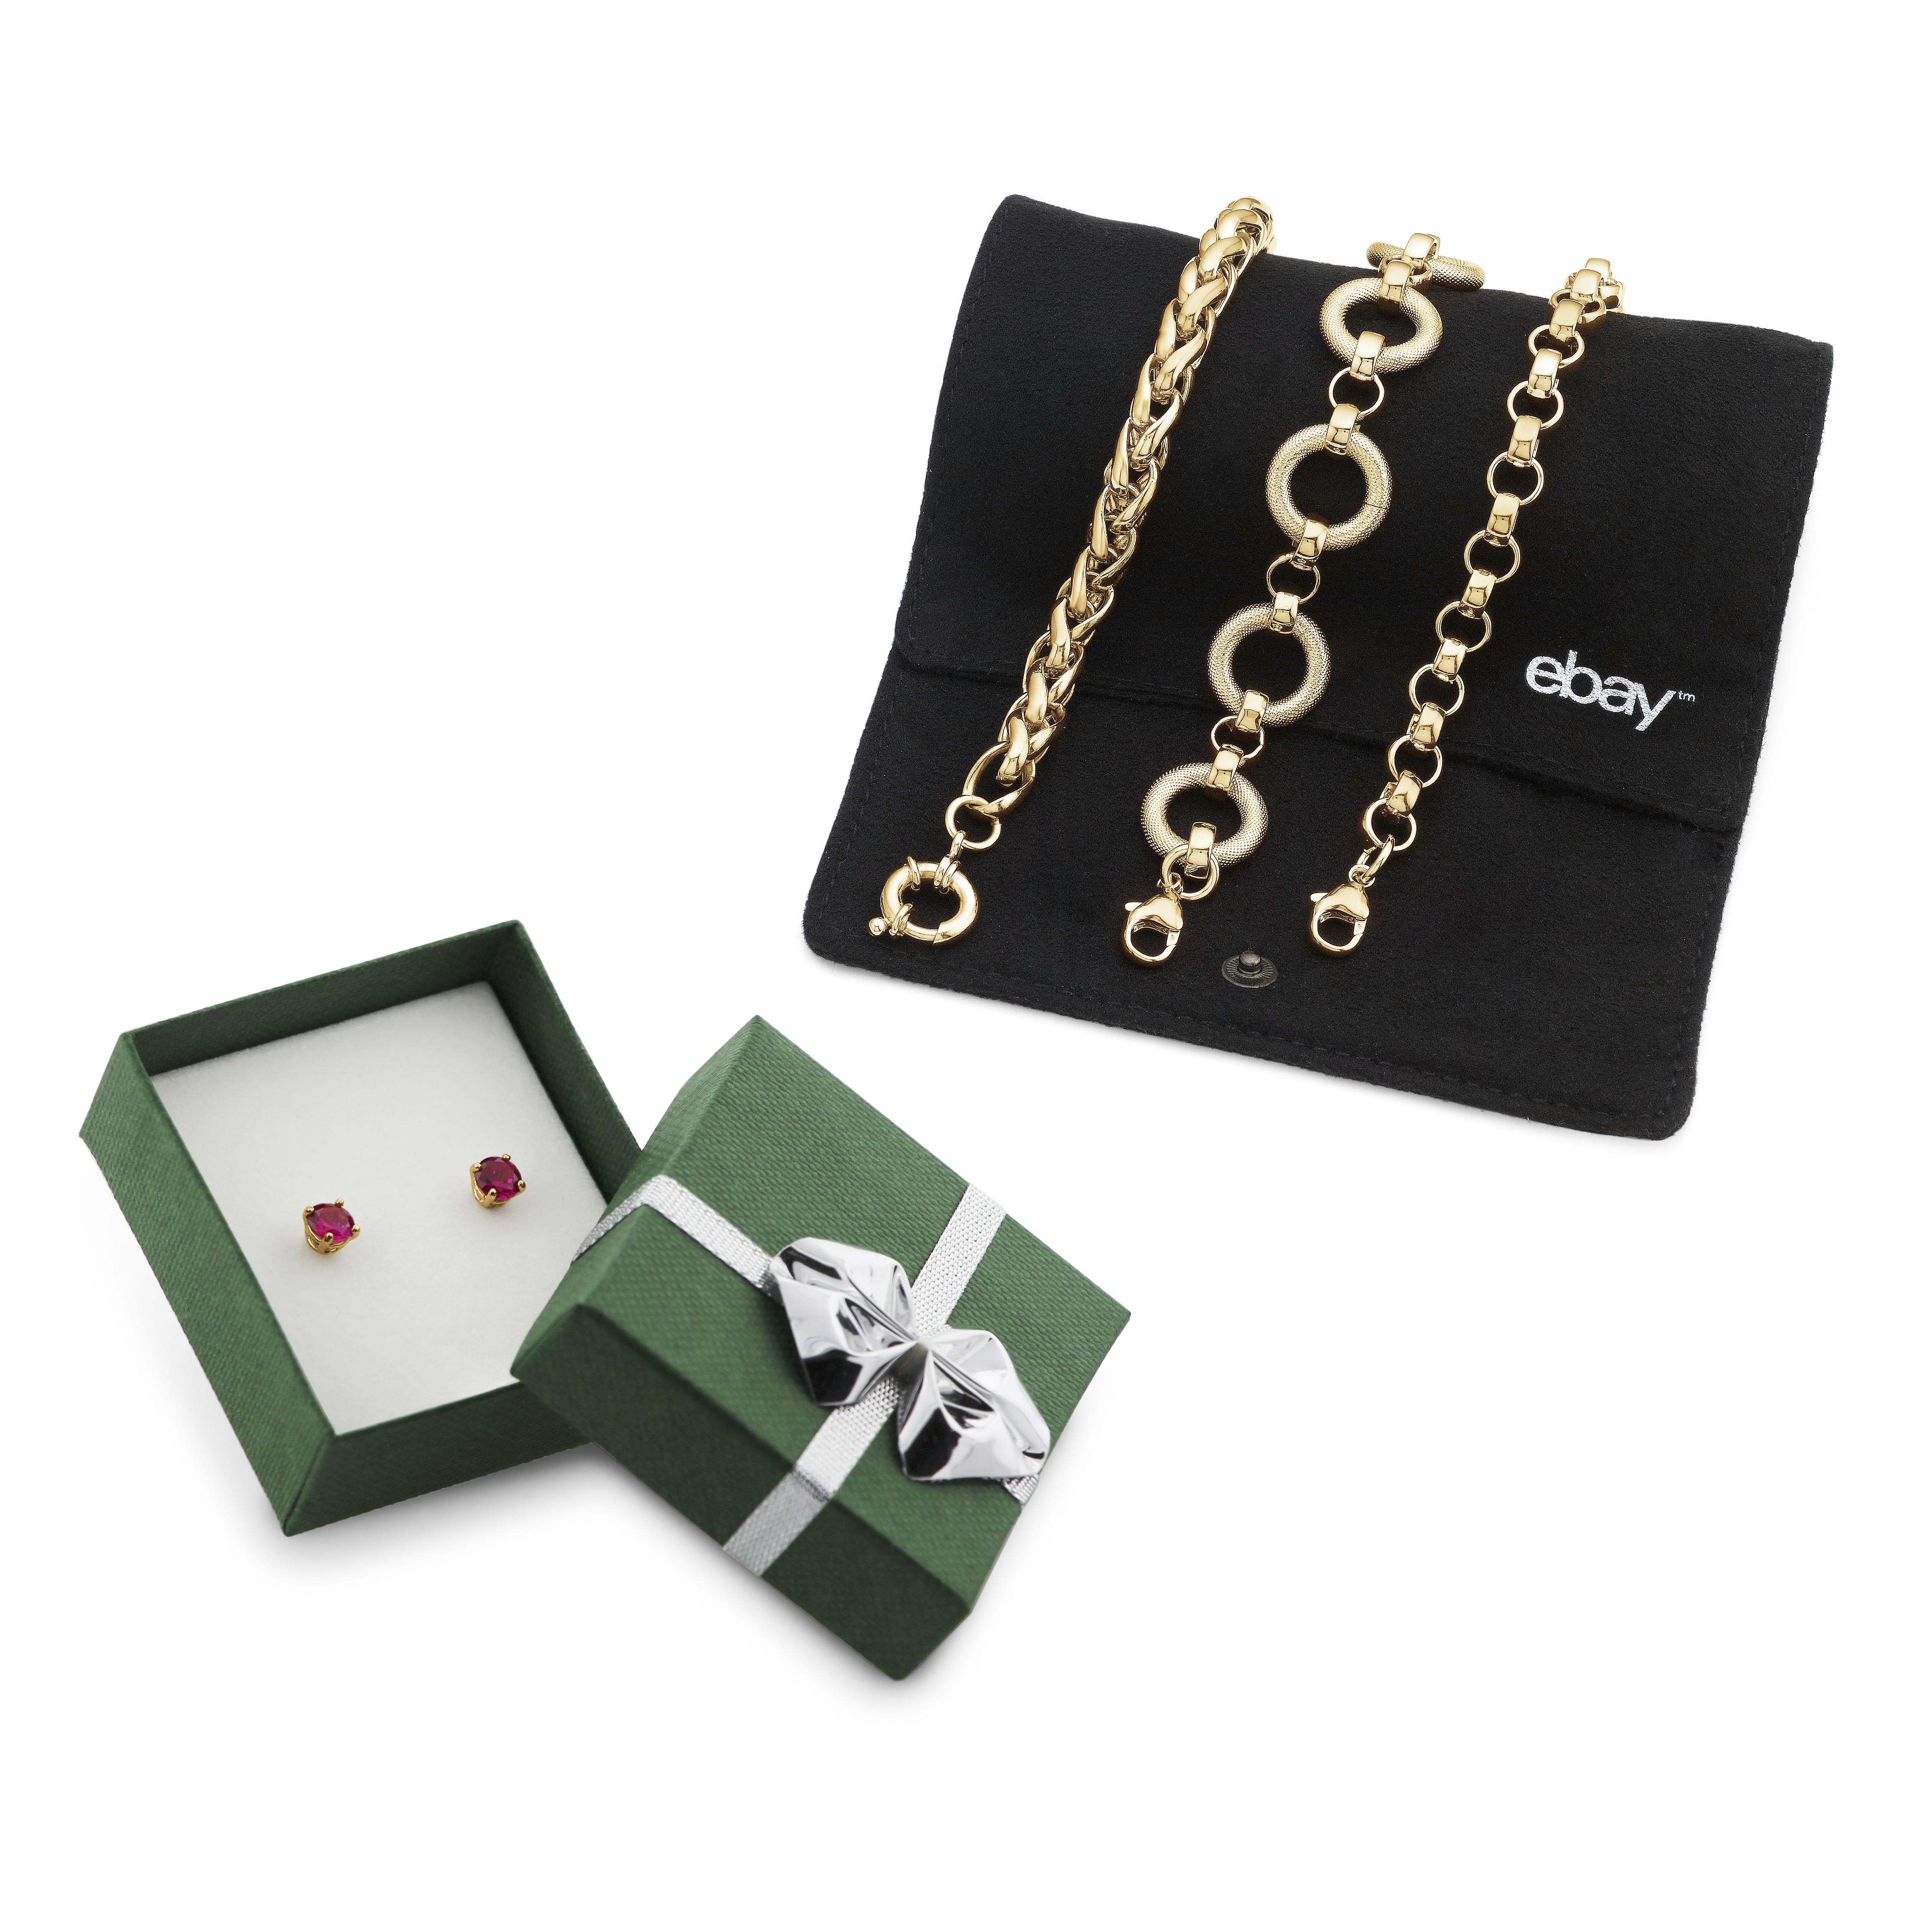 18K Gold-Plated Italian Bracelet + 2 Gifts